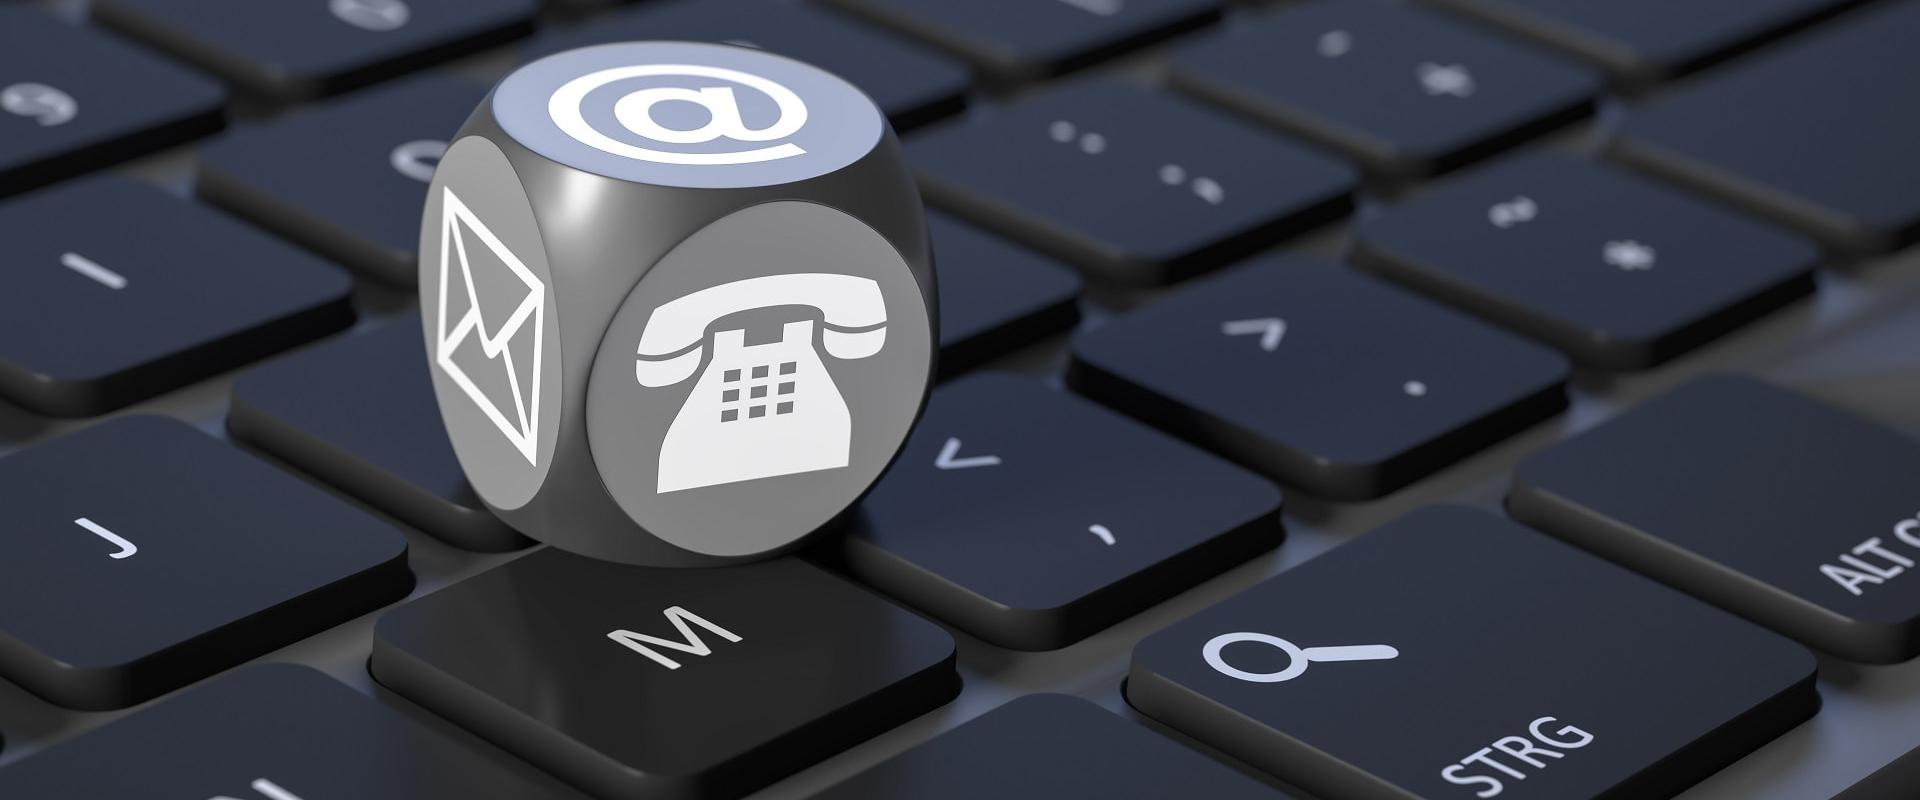 Kommunikationstechnik Telefon & Internet